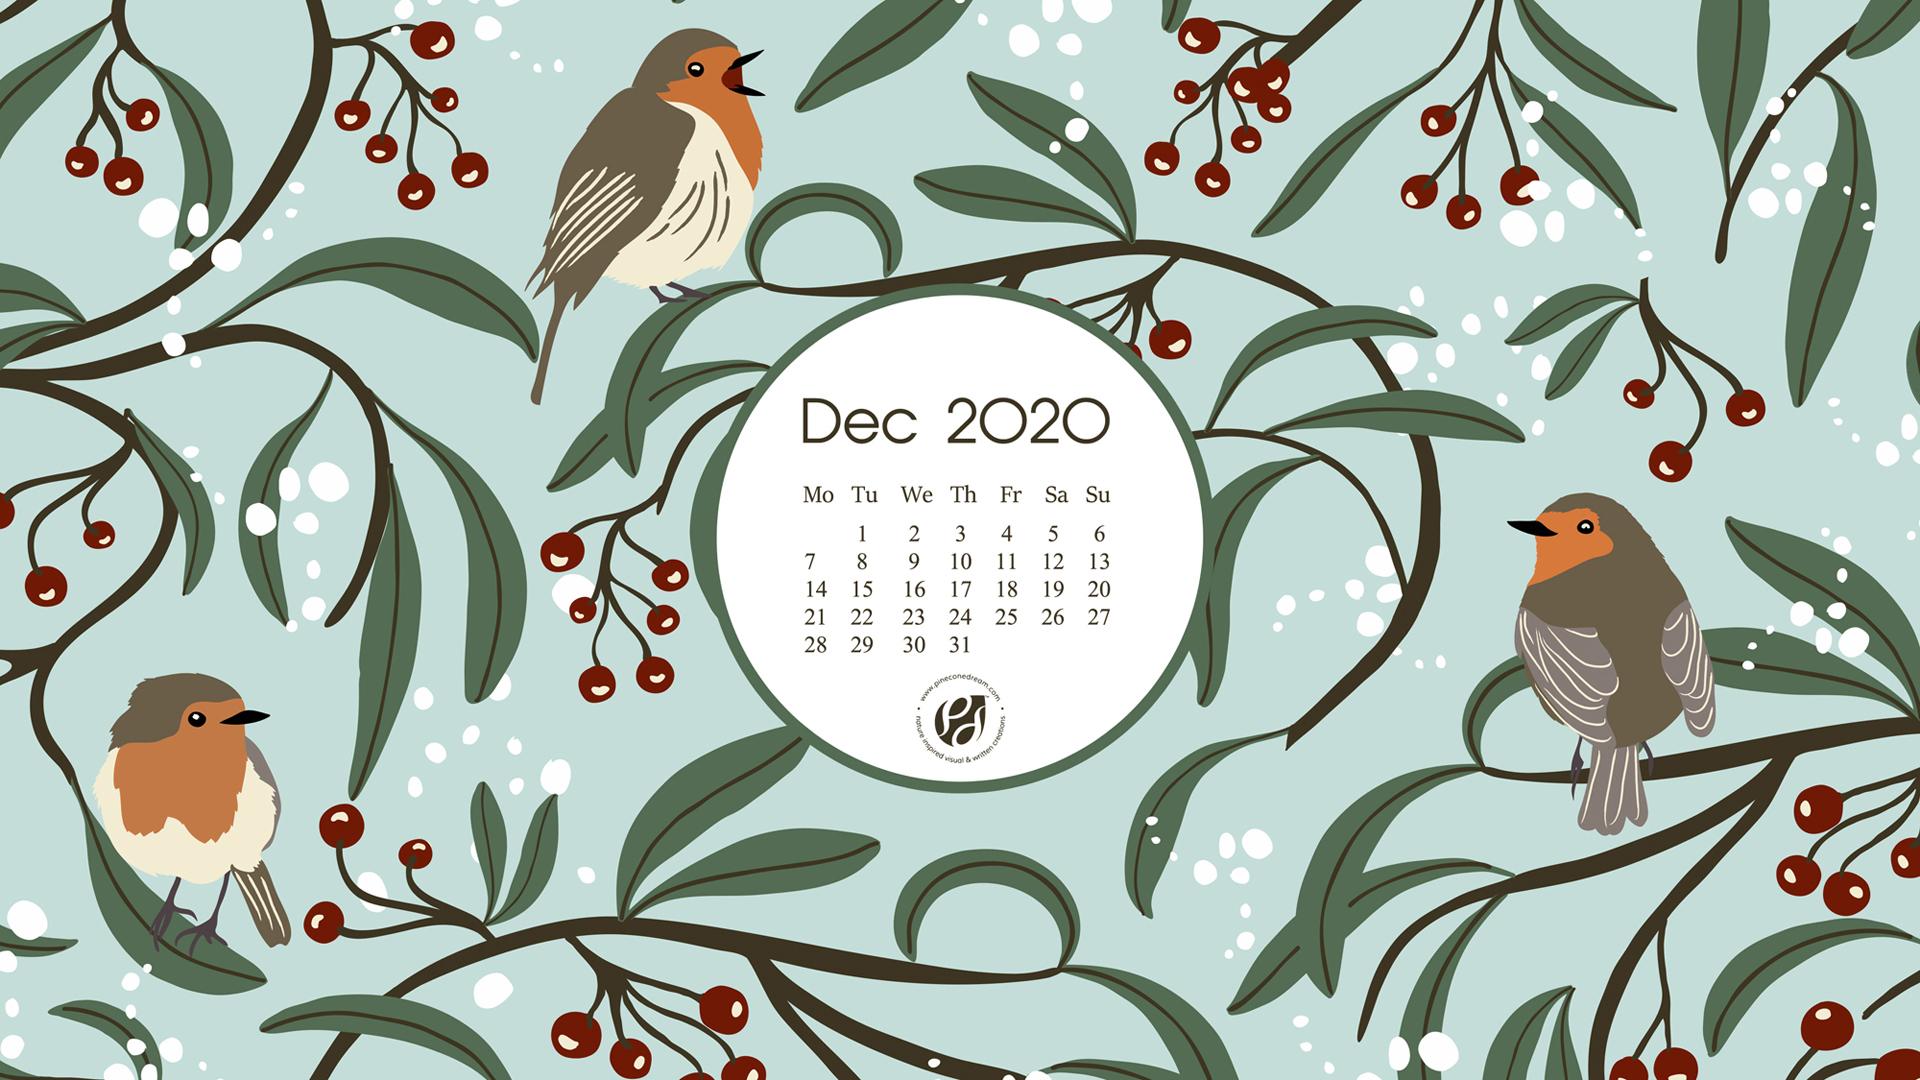 December 2020 calendar wallpapers printable planner 1920x1080